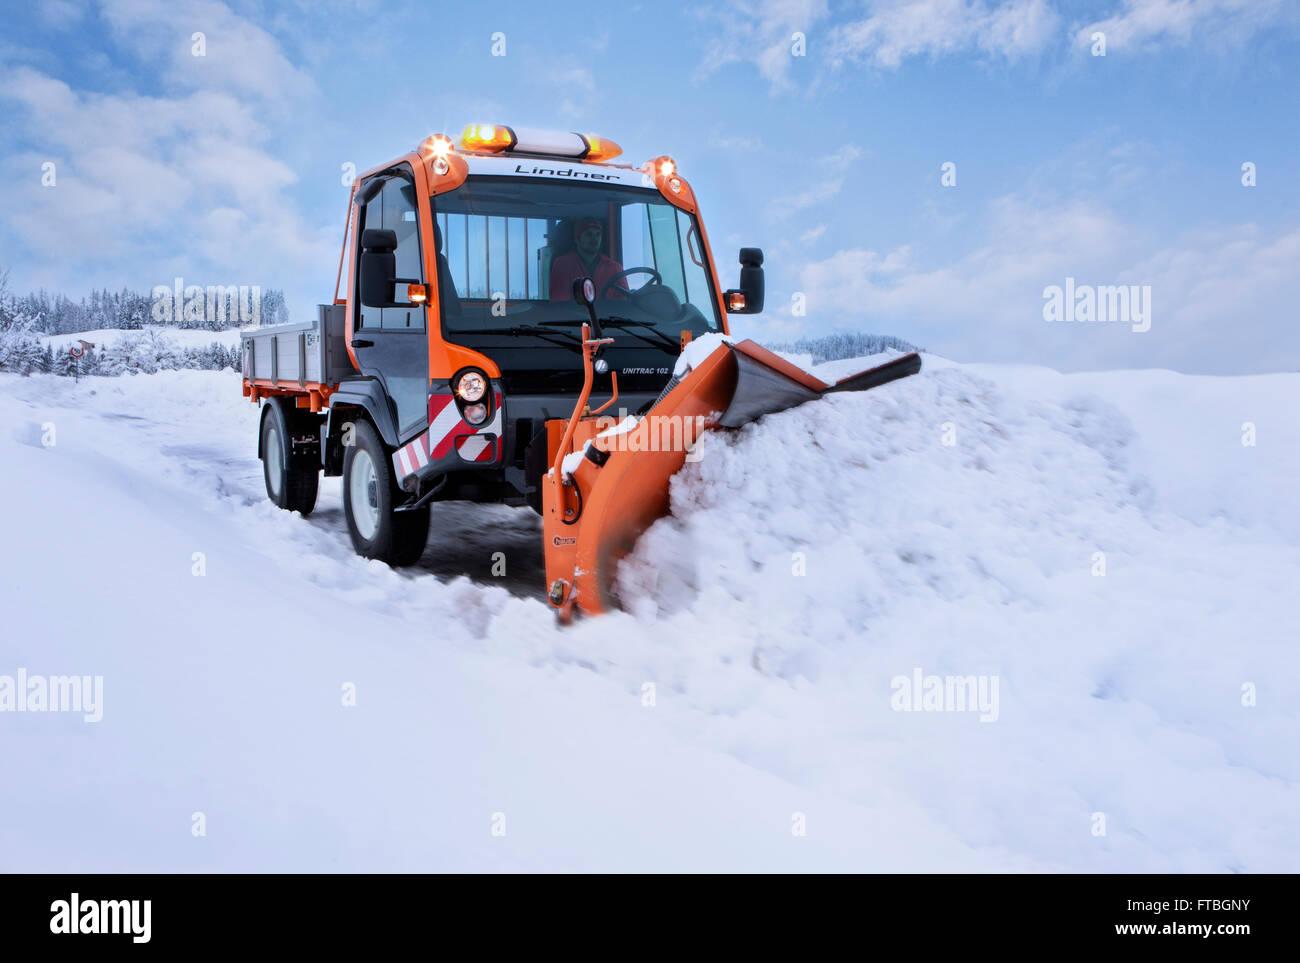 Snowplow removing snow, winter maintenance, Inn Valley, Kufstein district, Tyrol, Austria - Stock Image